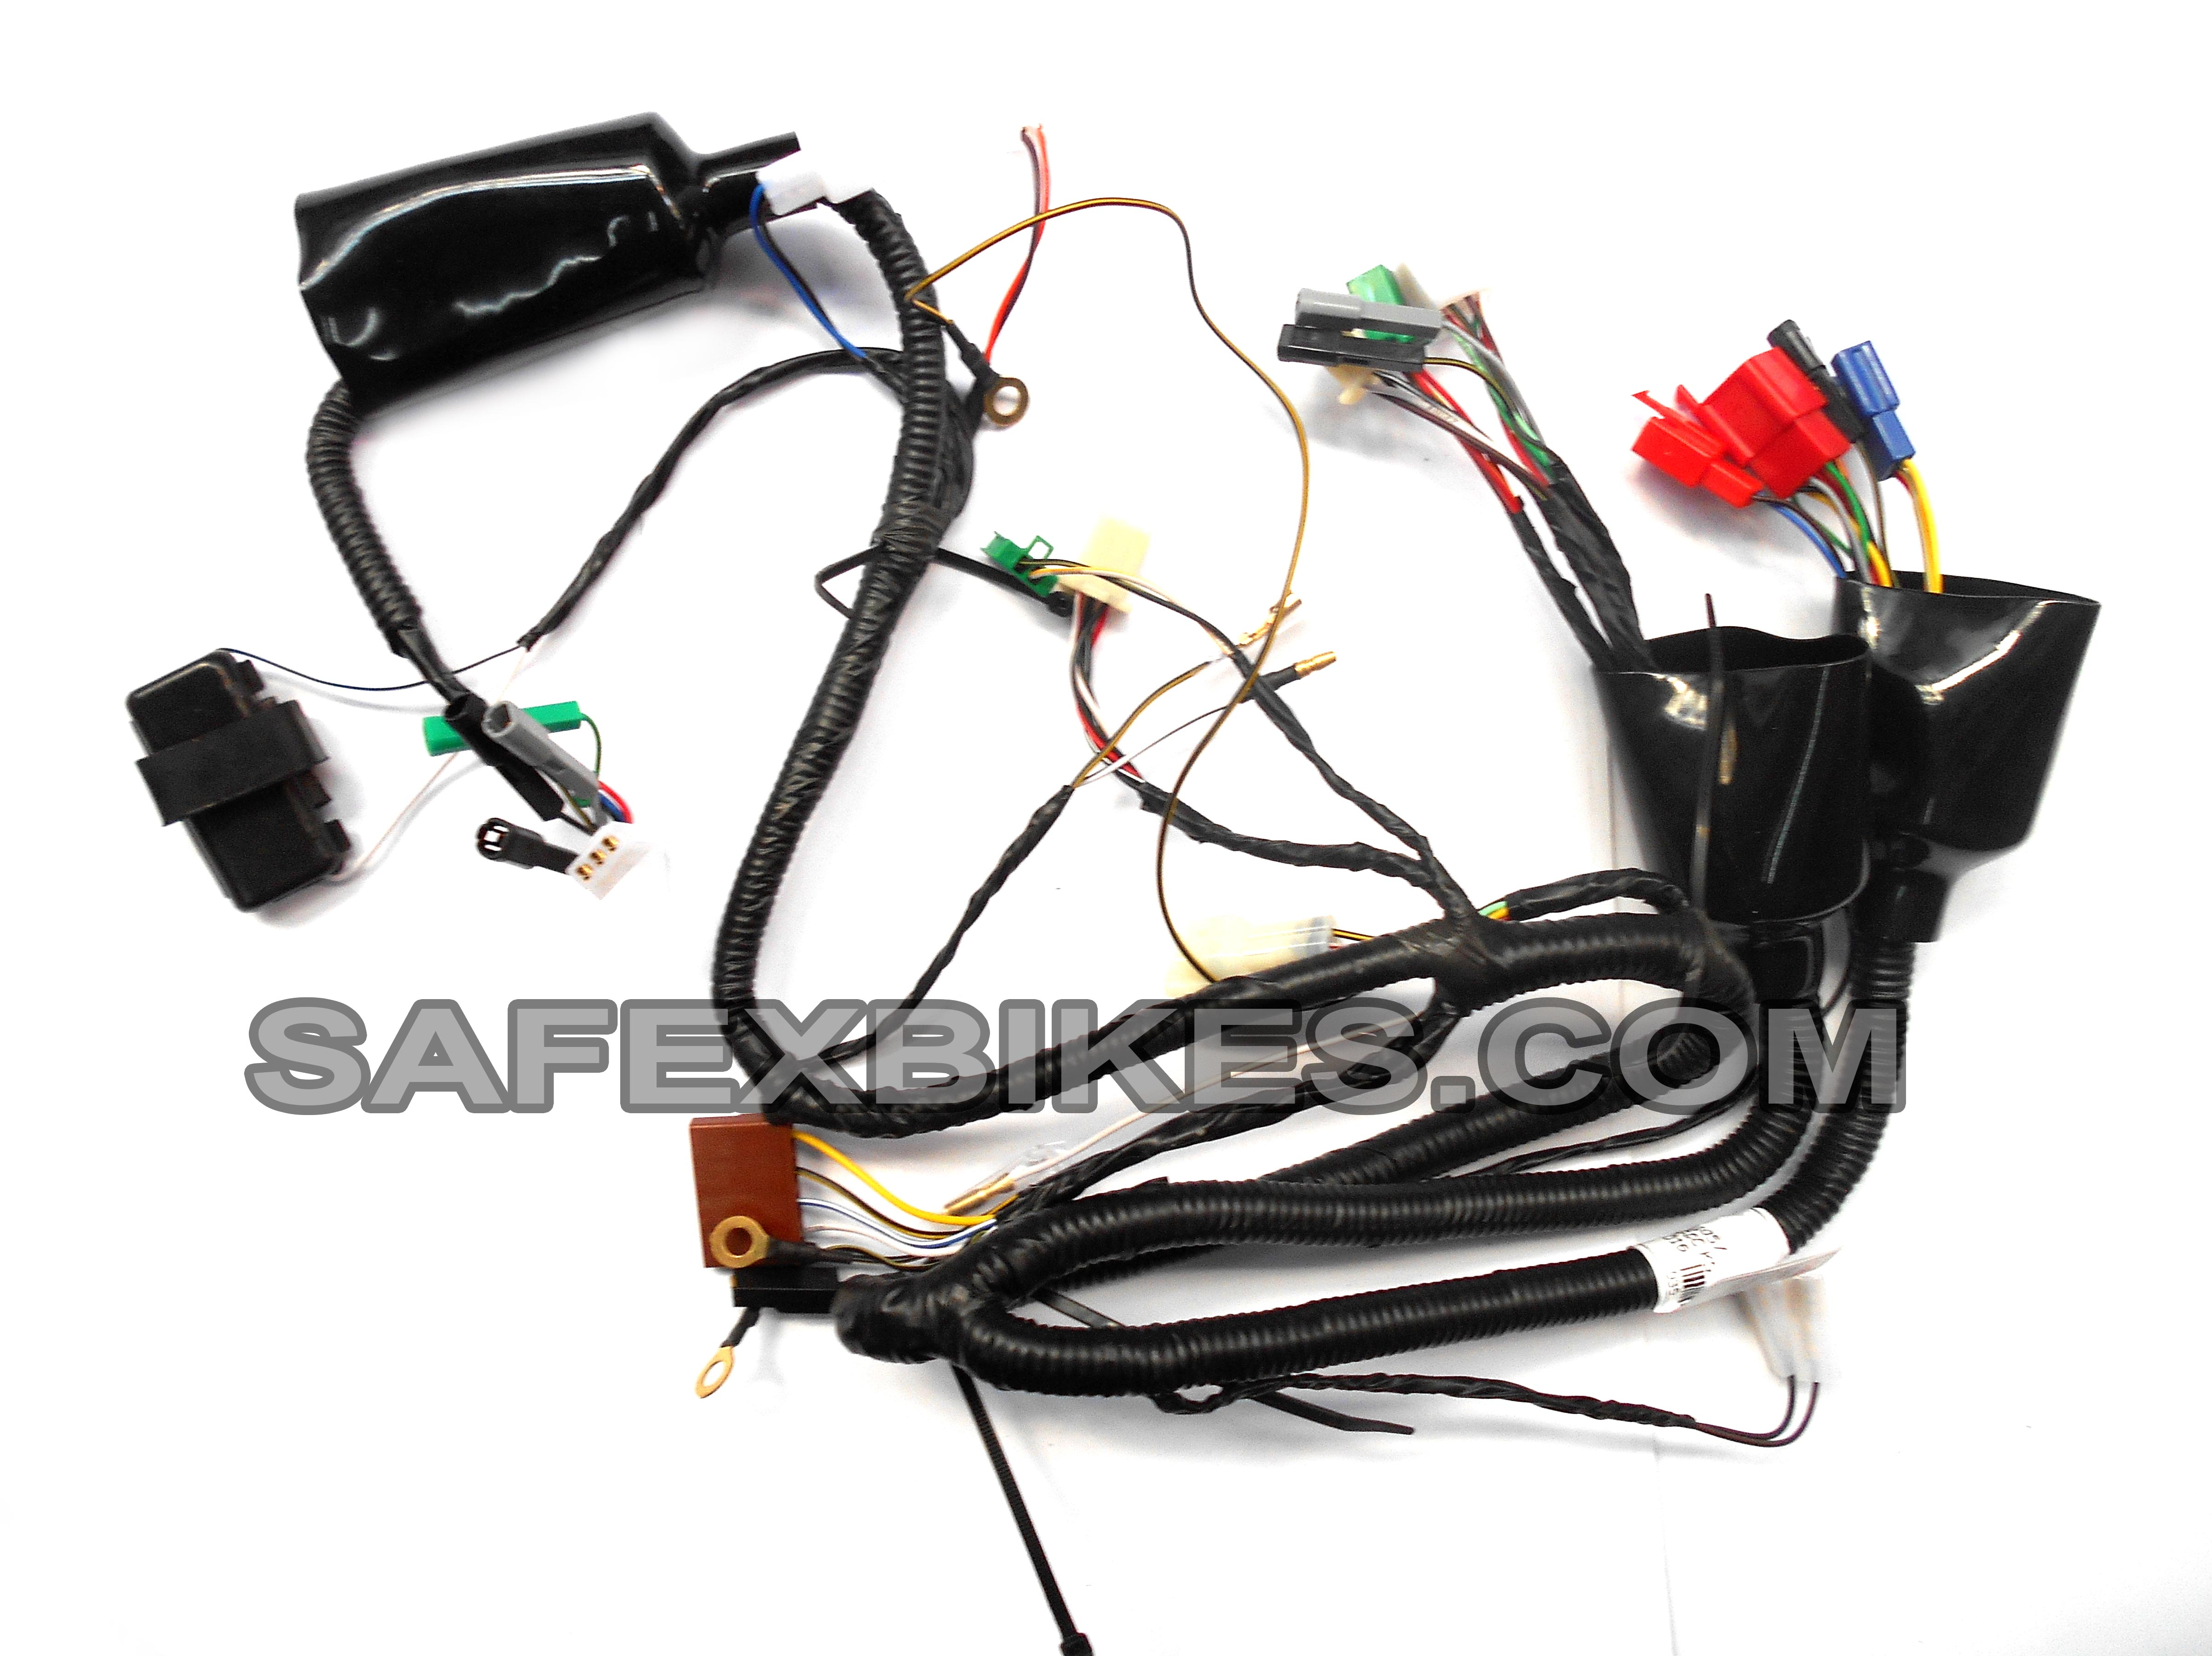 Generous Jensen Vm9311 Wire Harness Pictures Inspiration ...